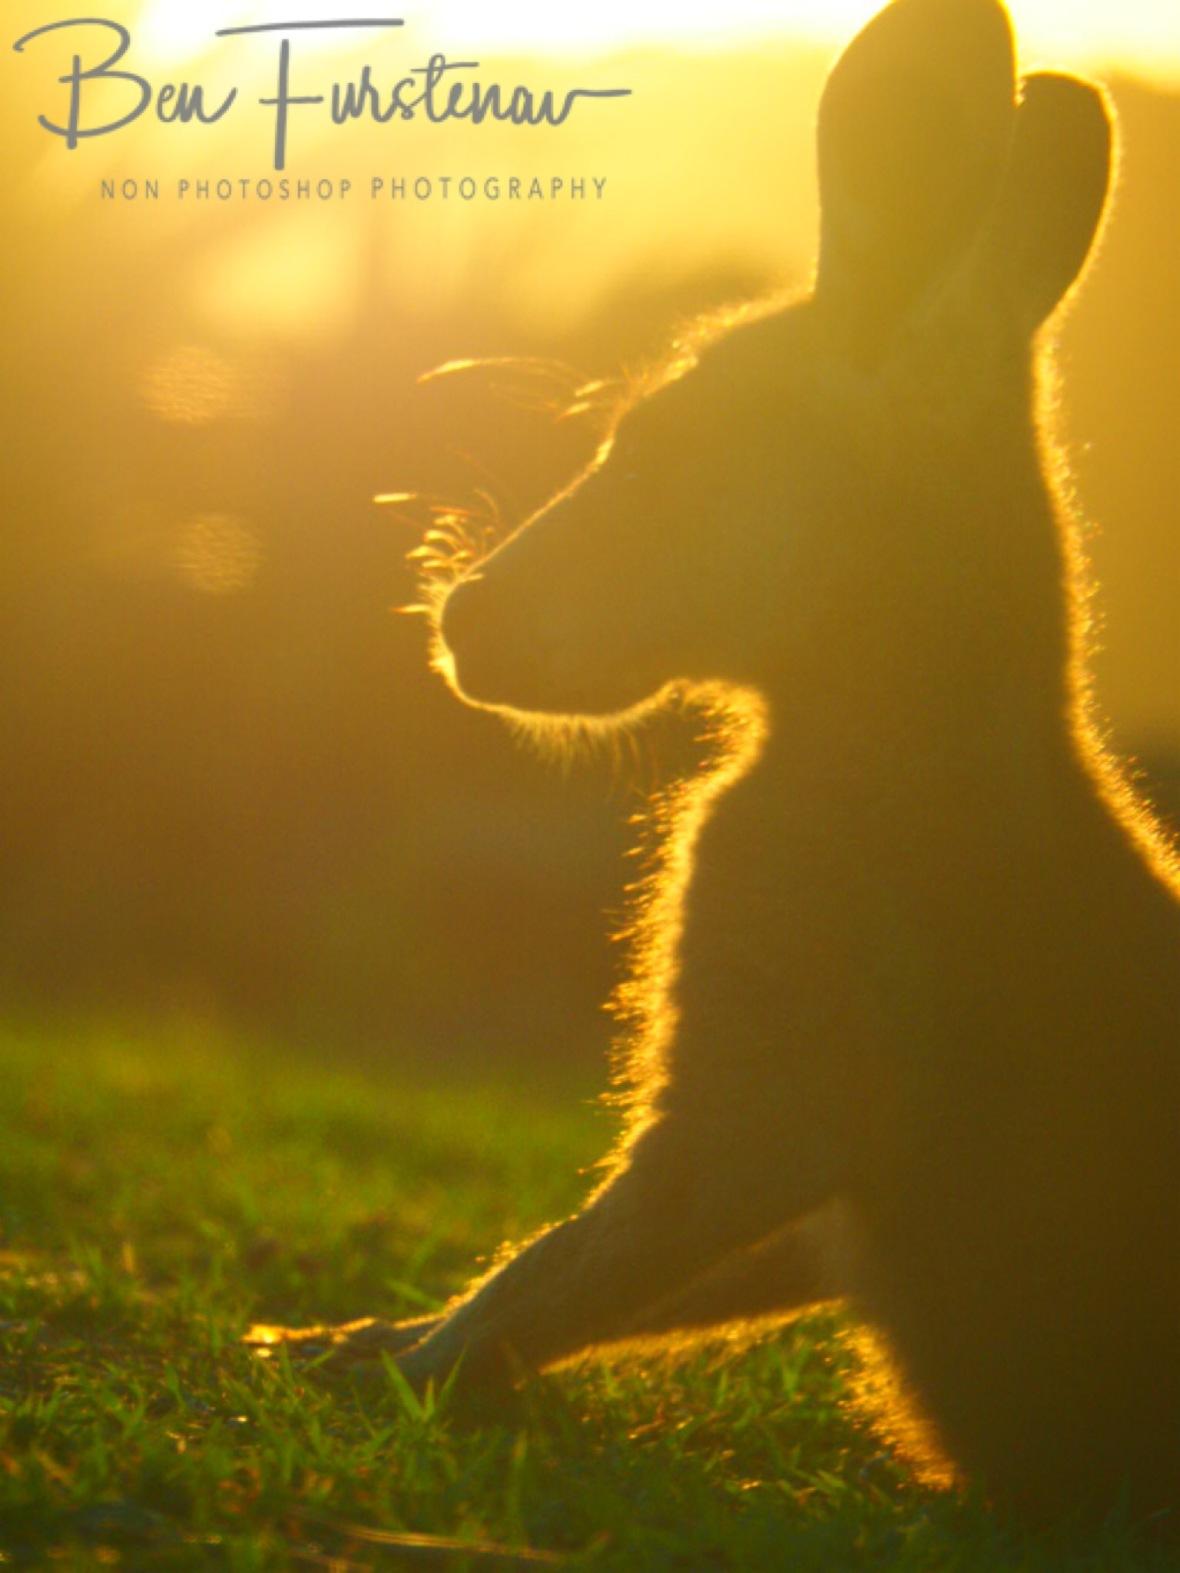 Fine print against setting sunshine @ Woody Head, Northern New South Wales, Australia